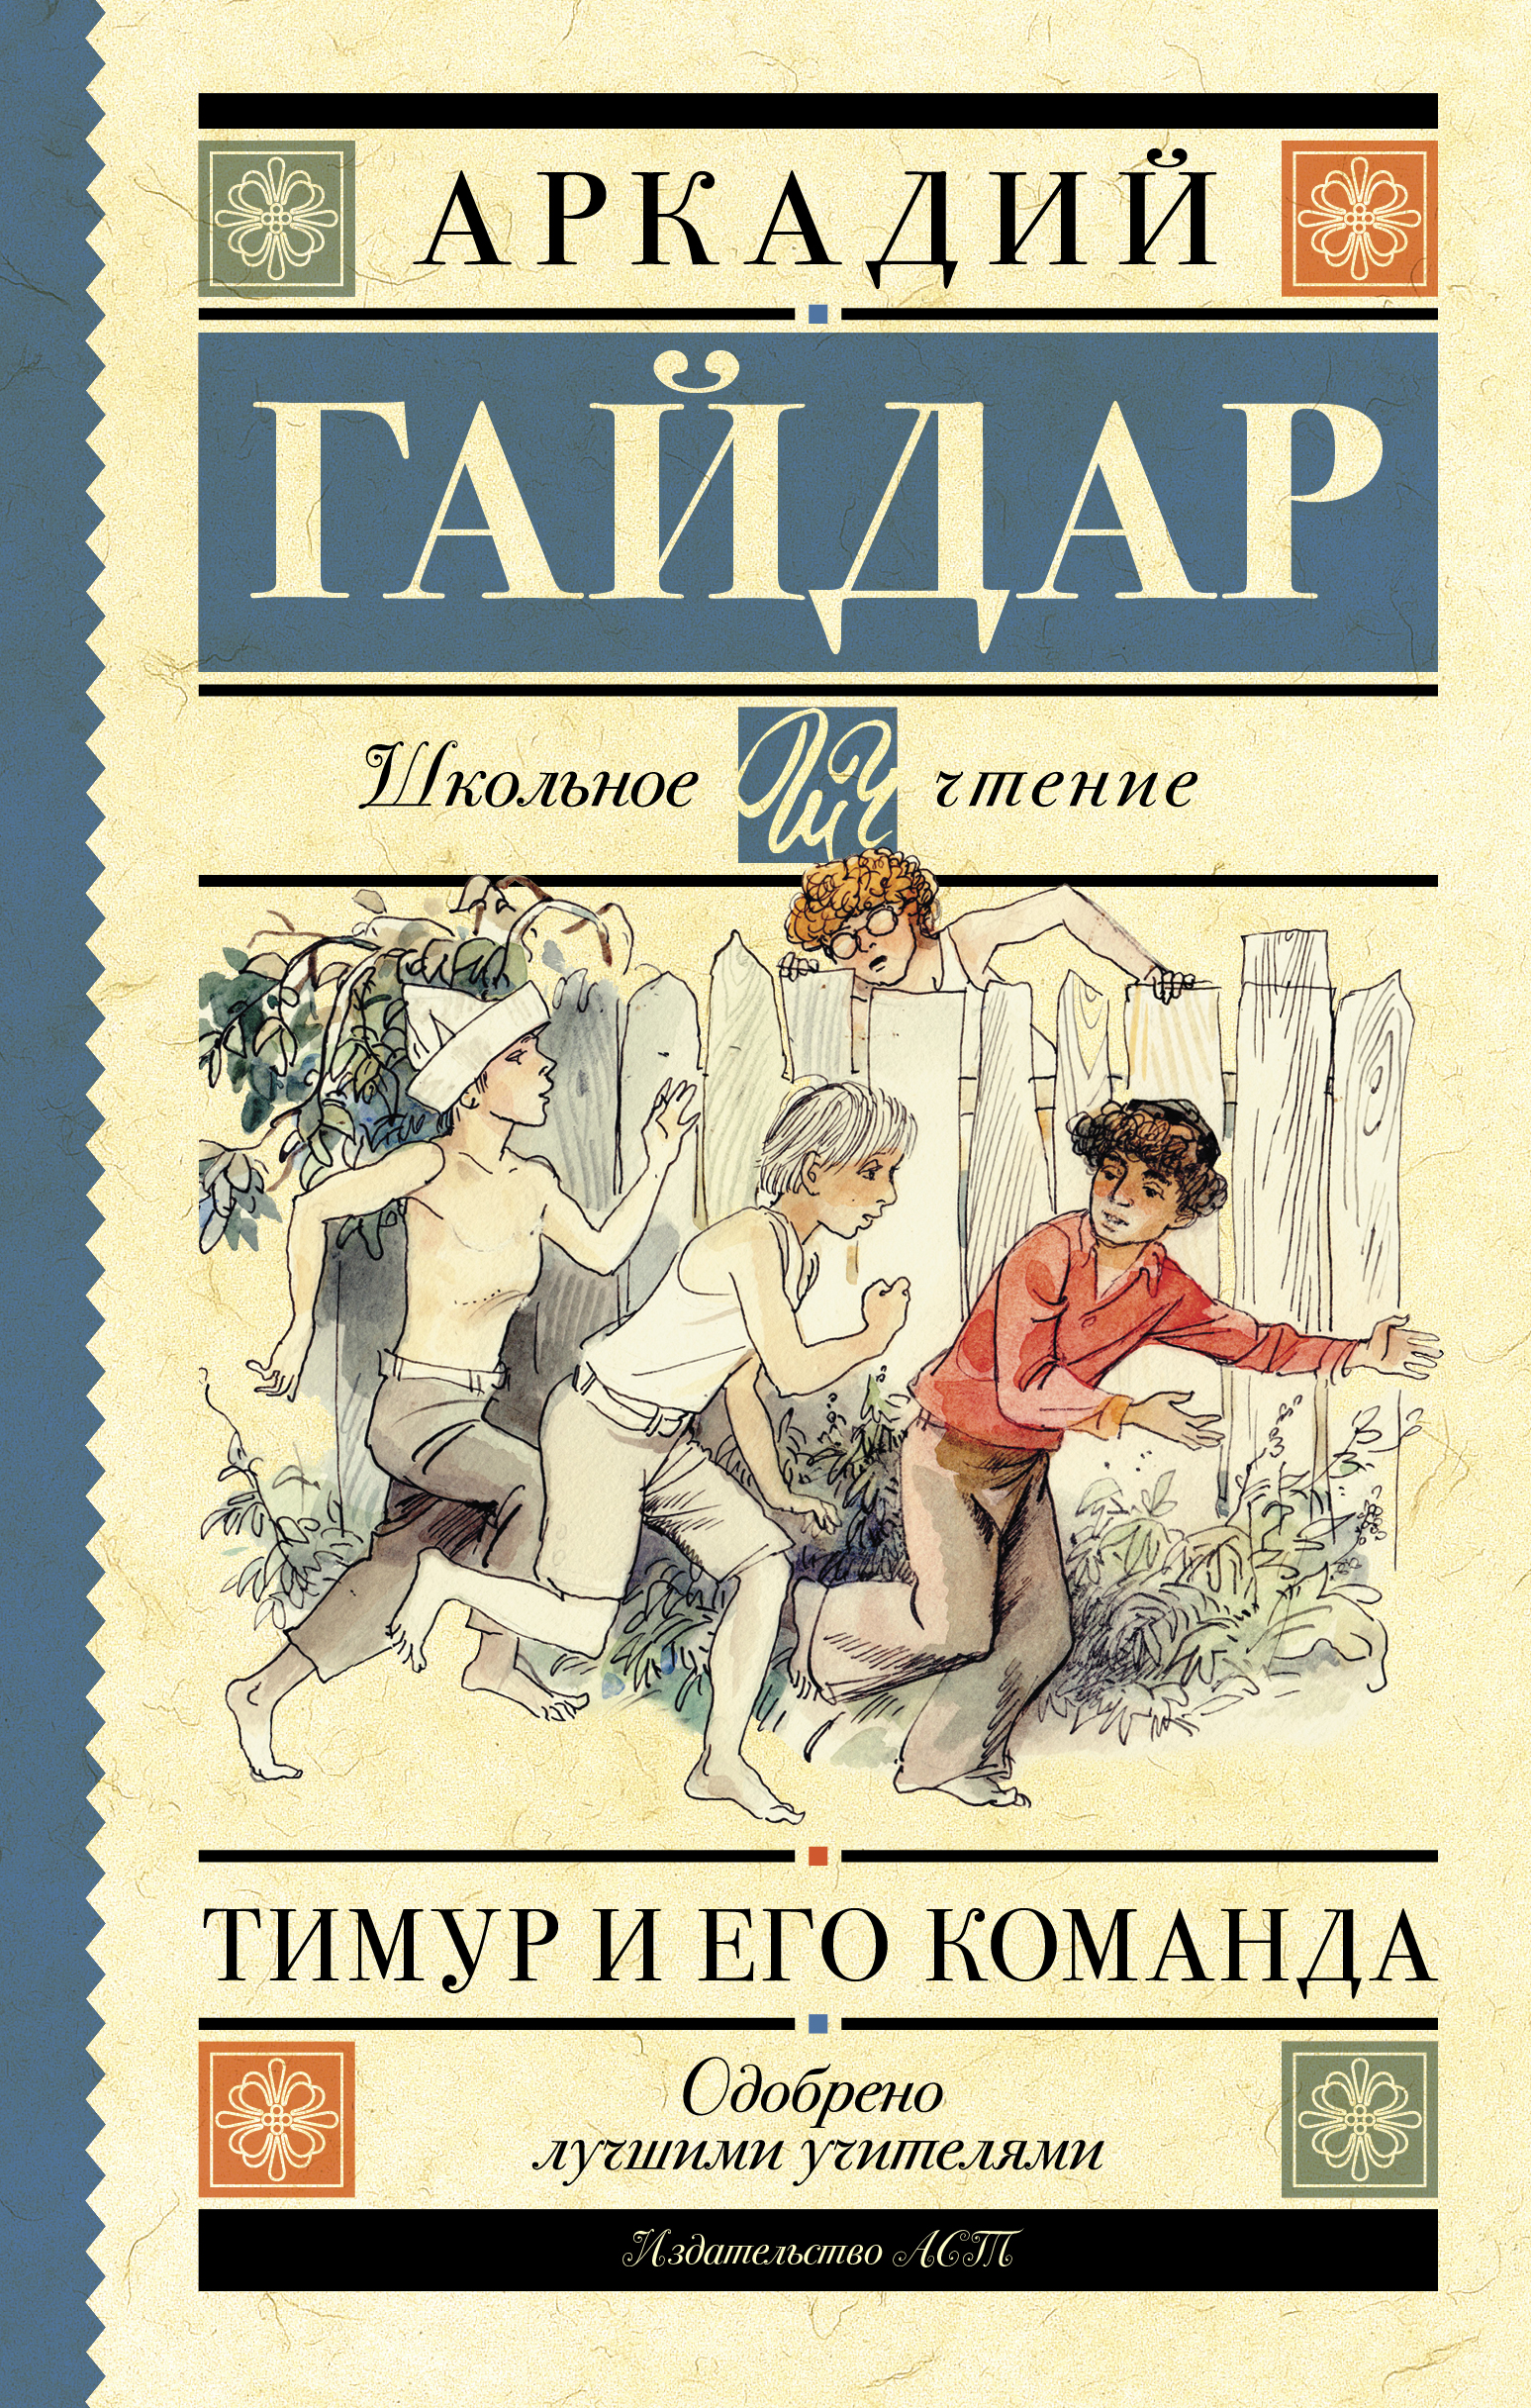 Гайдар А.П. Тимур и его команда вячеслав жуков на графских развалинах